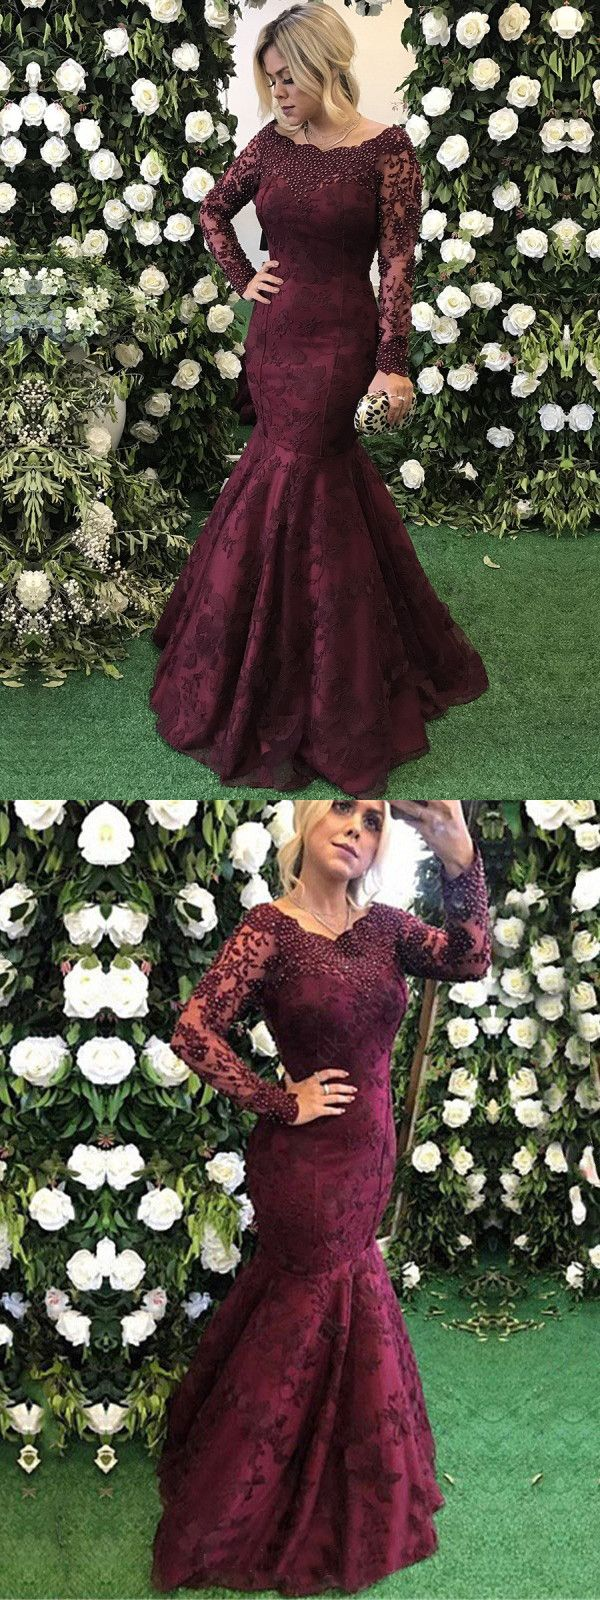 prom dress long,prom dress modest,prom dress simple,prom dress cheap,african prom dress,prom dress 2018,prom dress vintage,prom dresses mermaid,prom dresses lace,prom dresses with sleeves,prom dresses burgundy #demidress #prom #promdress #promdresses #promdresslong  #womensfashion #womenswear #mermaid #mermaidparty #lace #lacedress #laceweddingdresses #burgundy #plus #plussize #plussizedresses